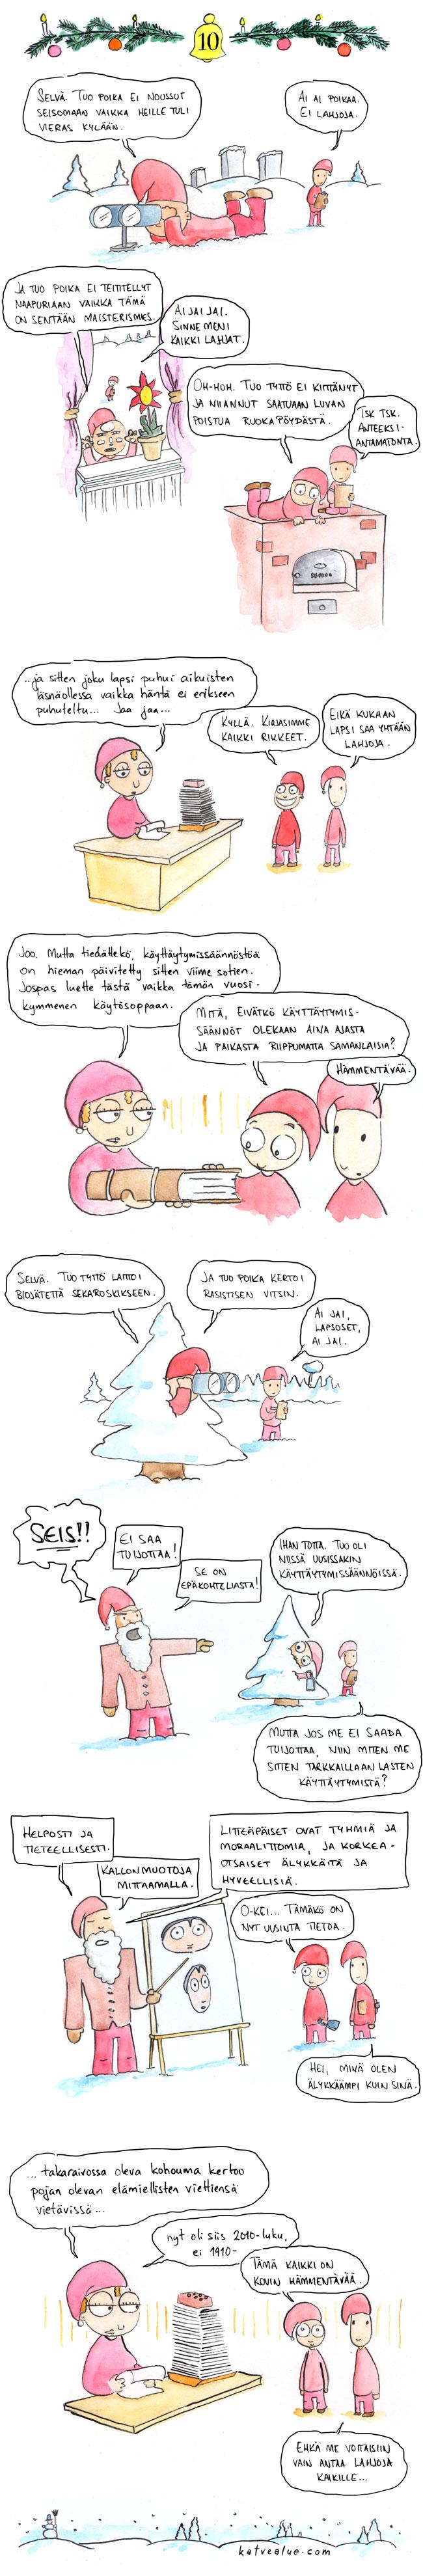 Joulu: Tuhmuus